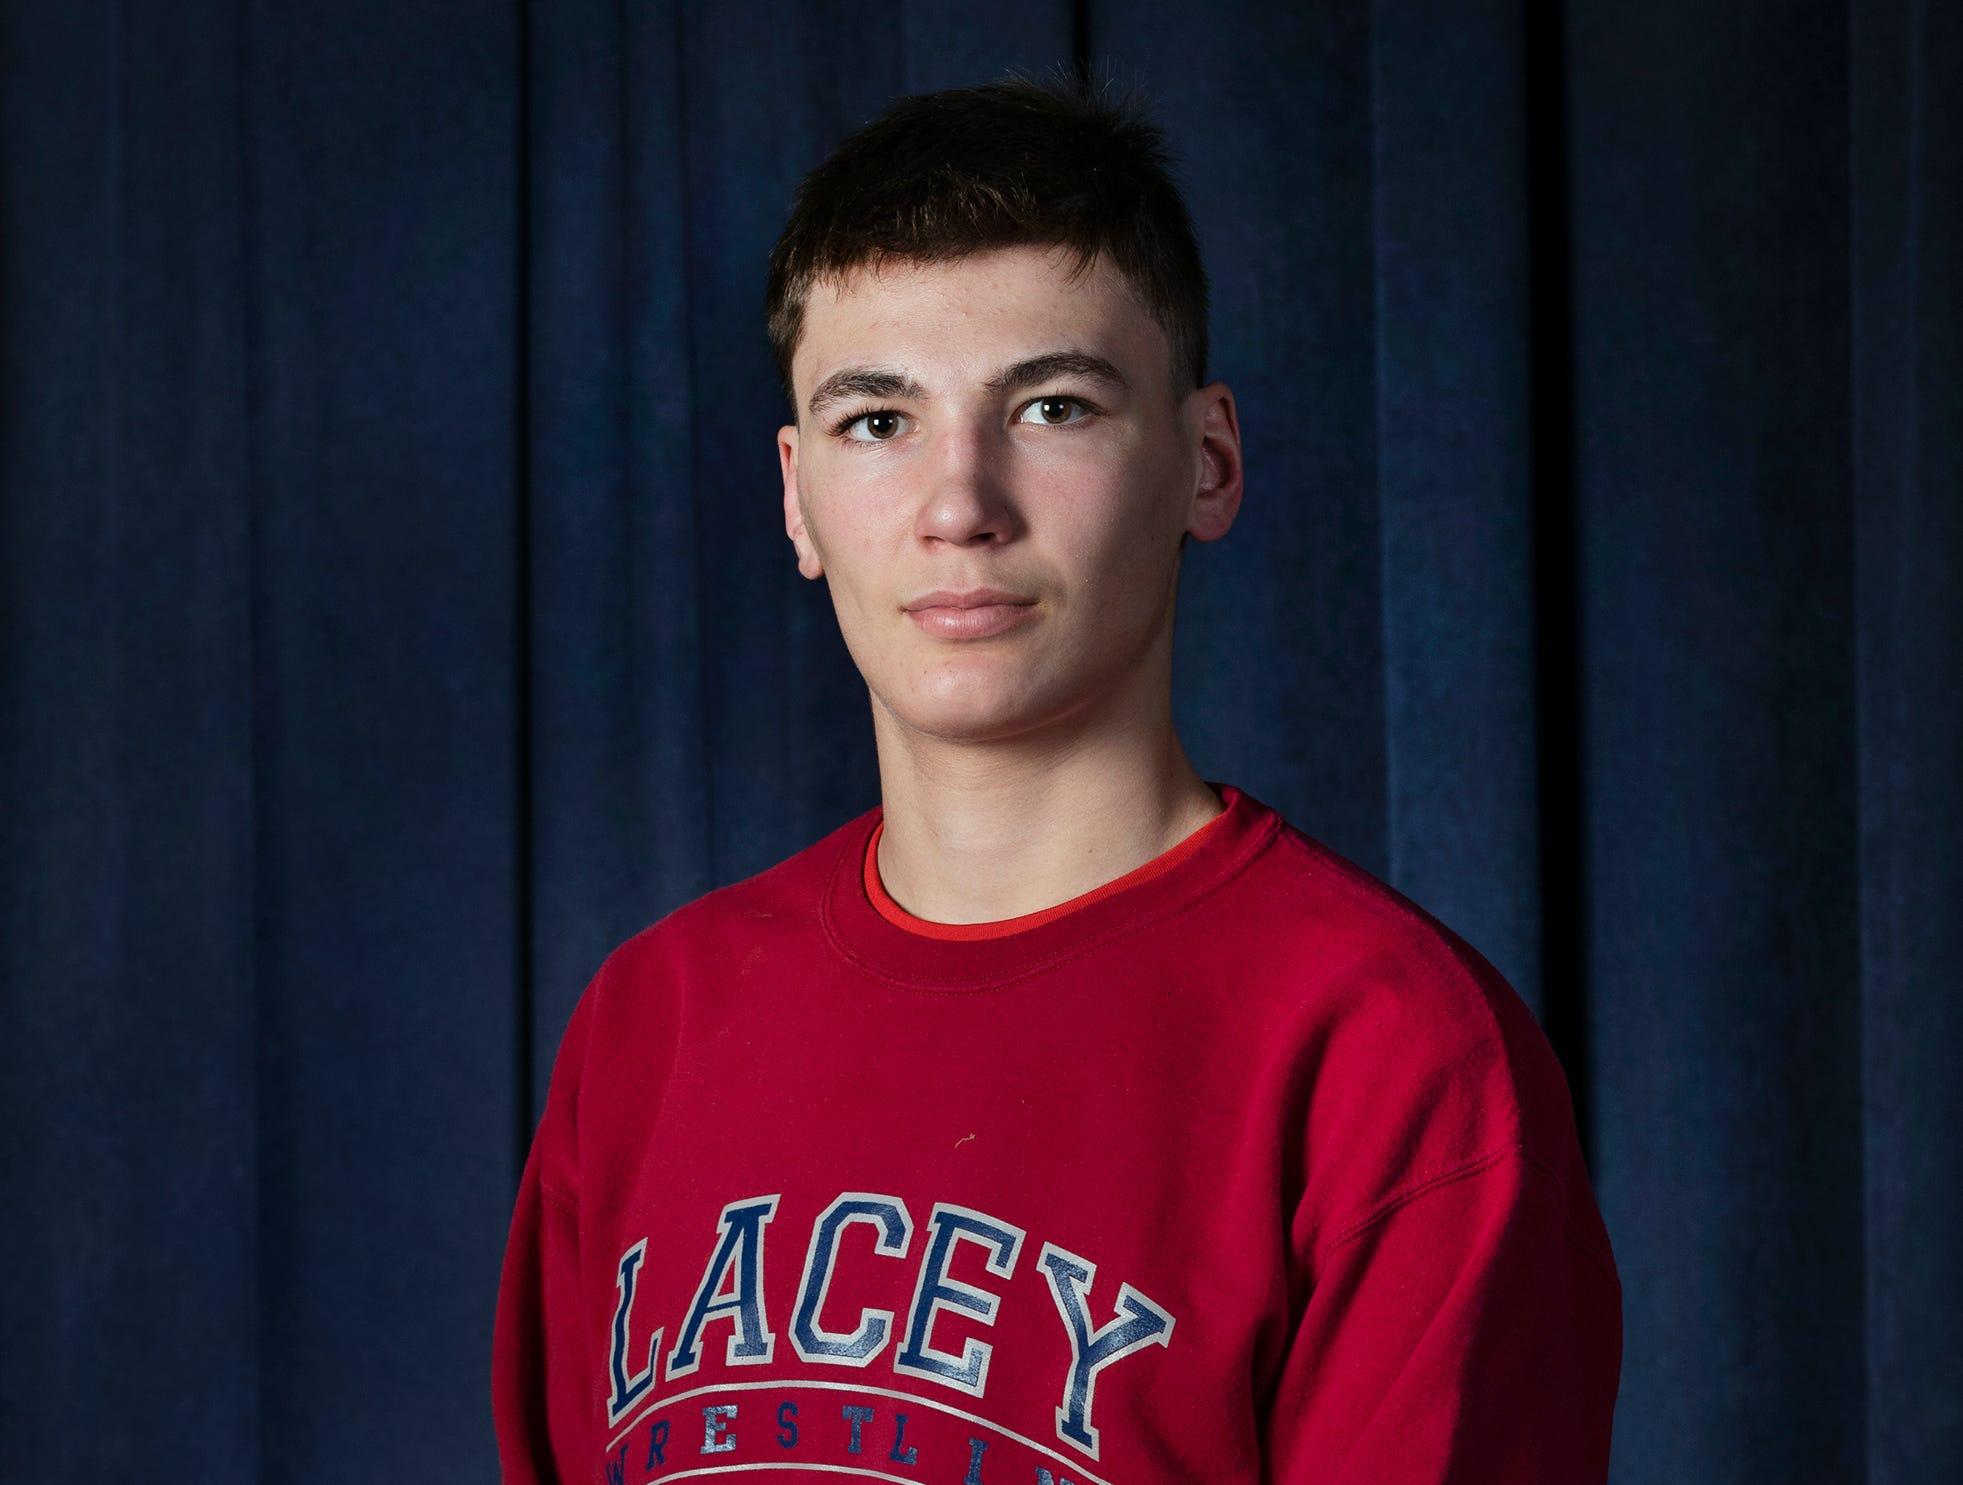 Hunter GutierrezLacey High School2019 Boys All Shore Wrestling